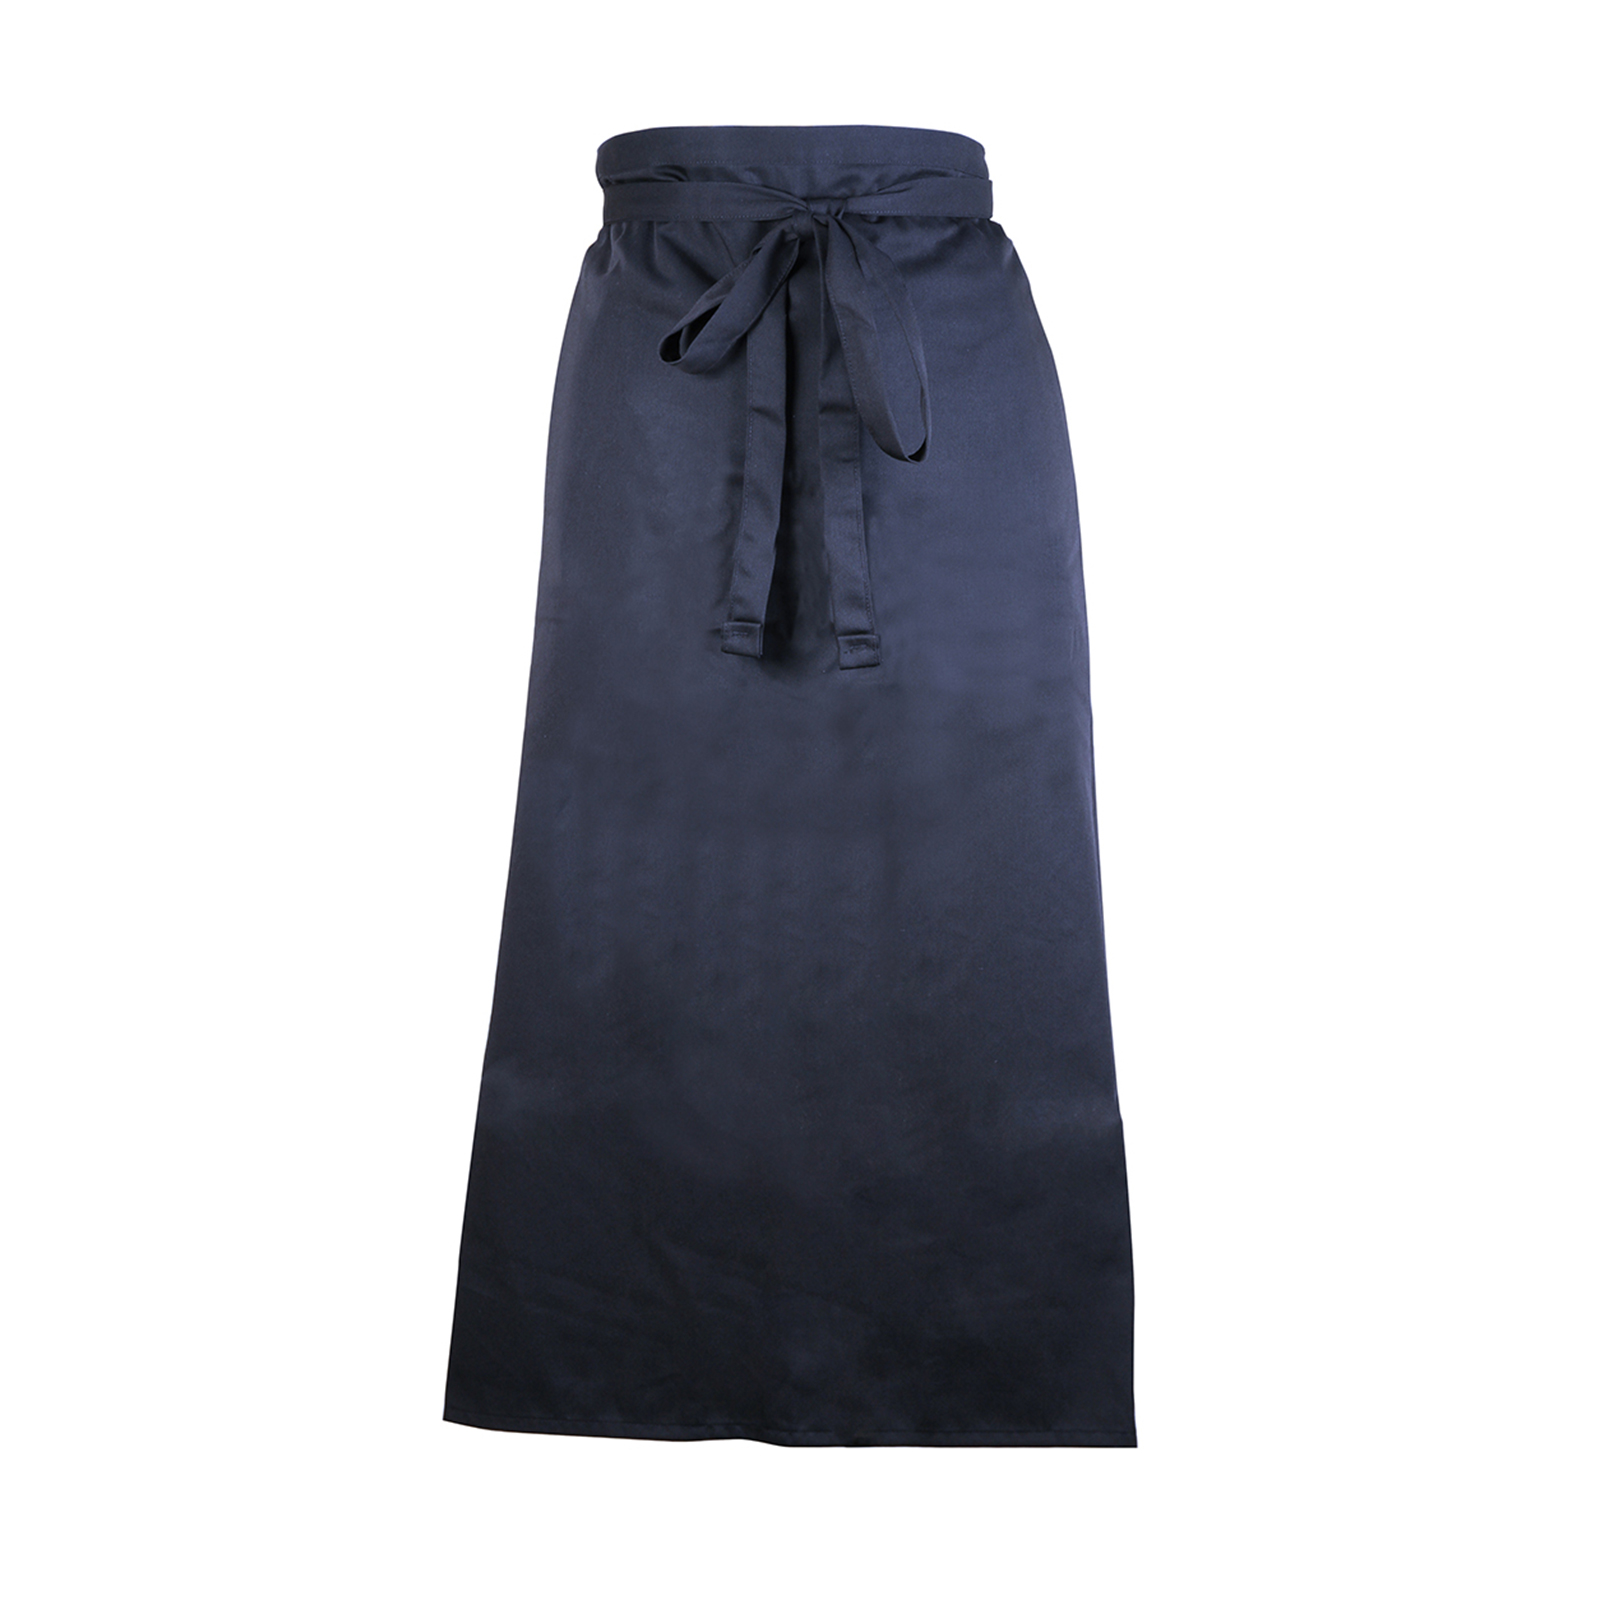 Mercer Culinary M61130NB waist apron